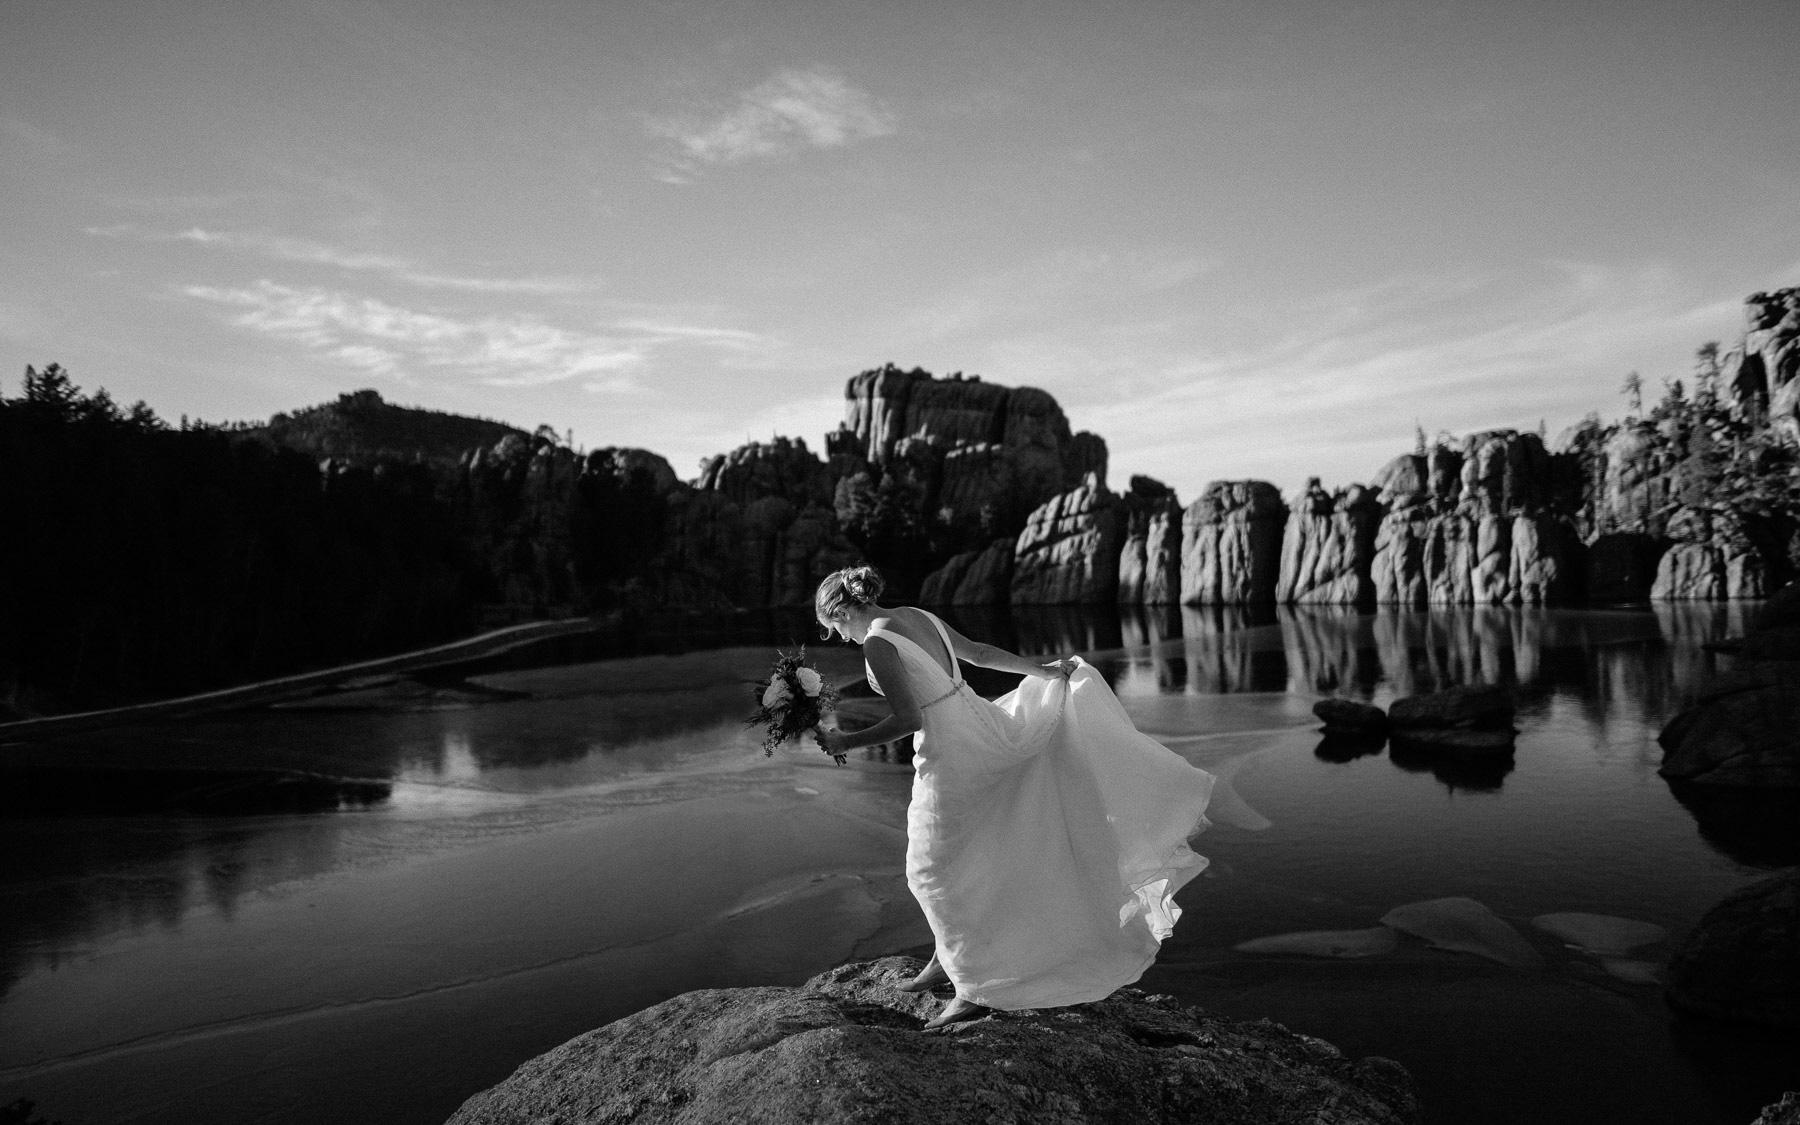 sioux-falls-black-hills-rapid-city-elopement-wedding-adventure-photographer-custer-sylvan-lake-26.jpg